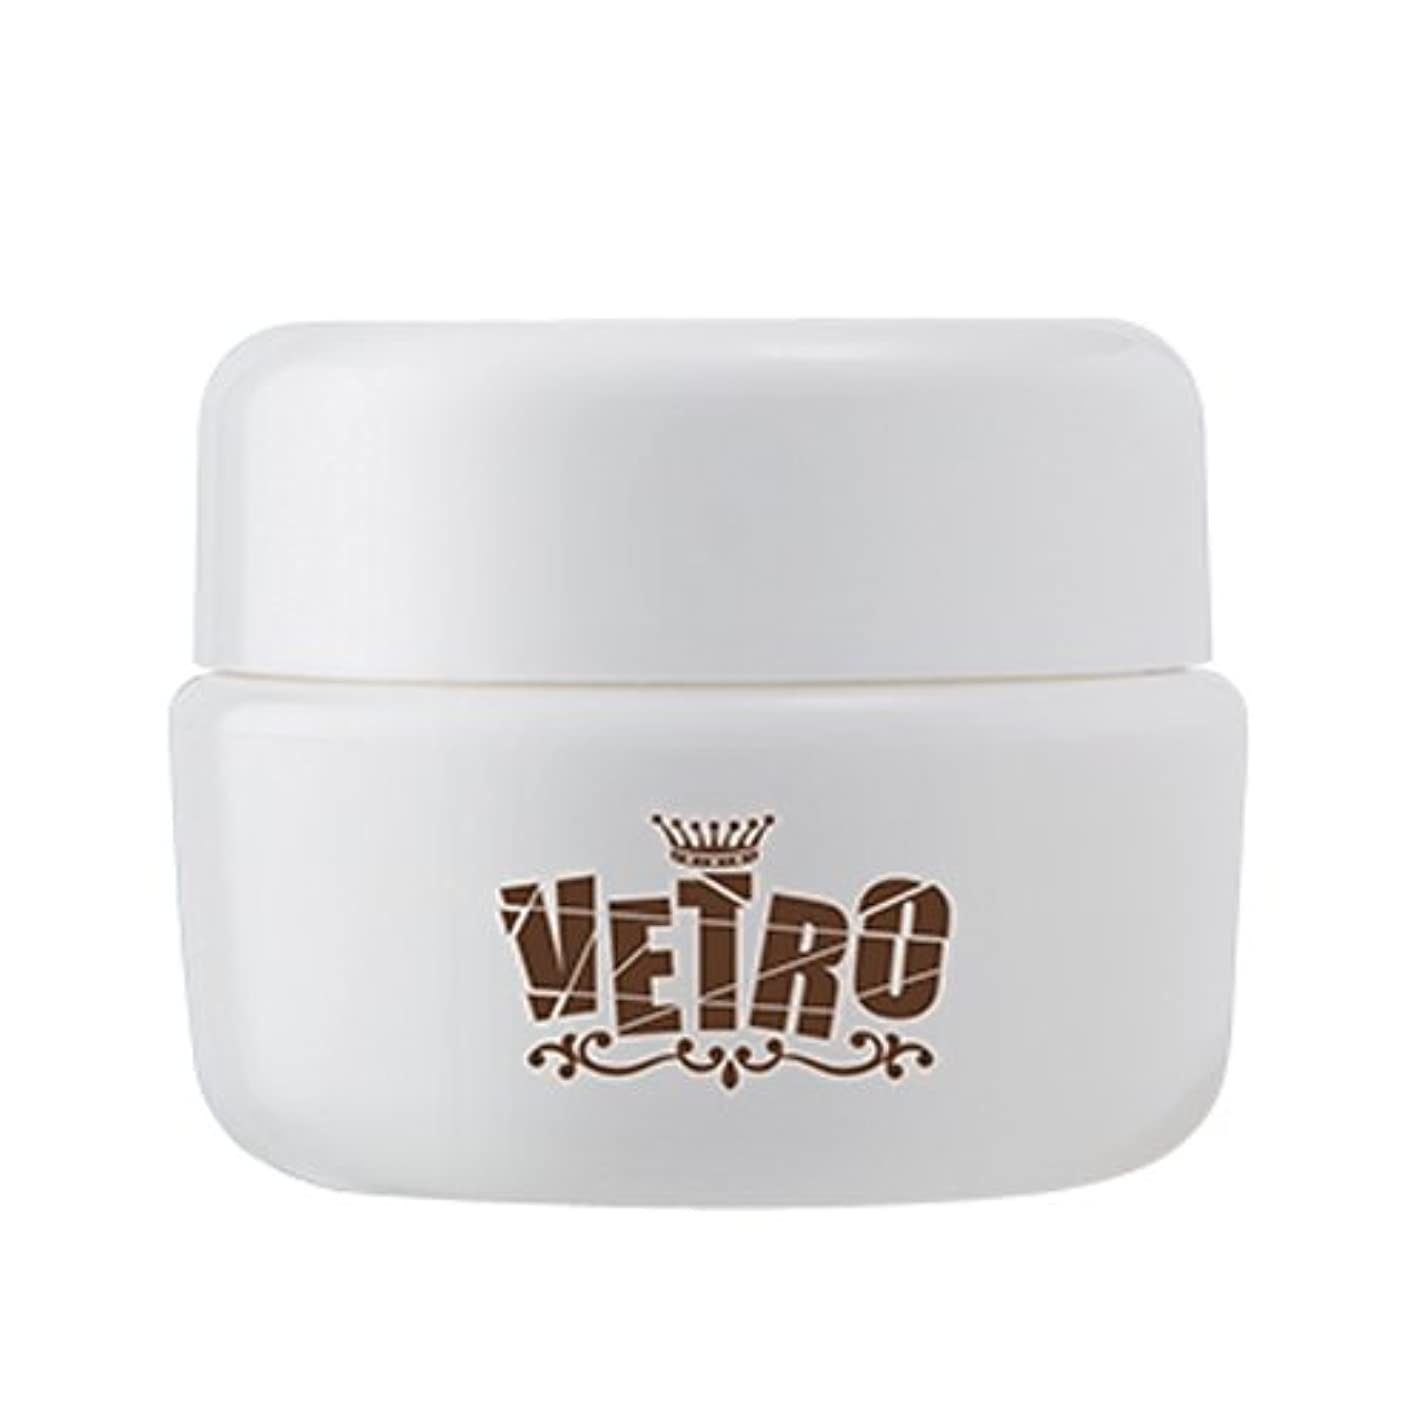 VETRO ベトロ NO.19 カラージェル 4ml VL051ラテンスキン